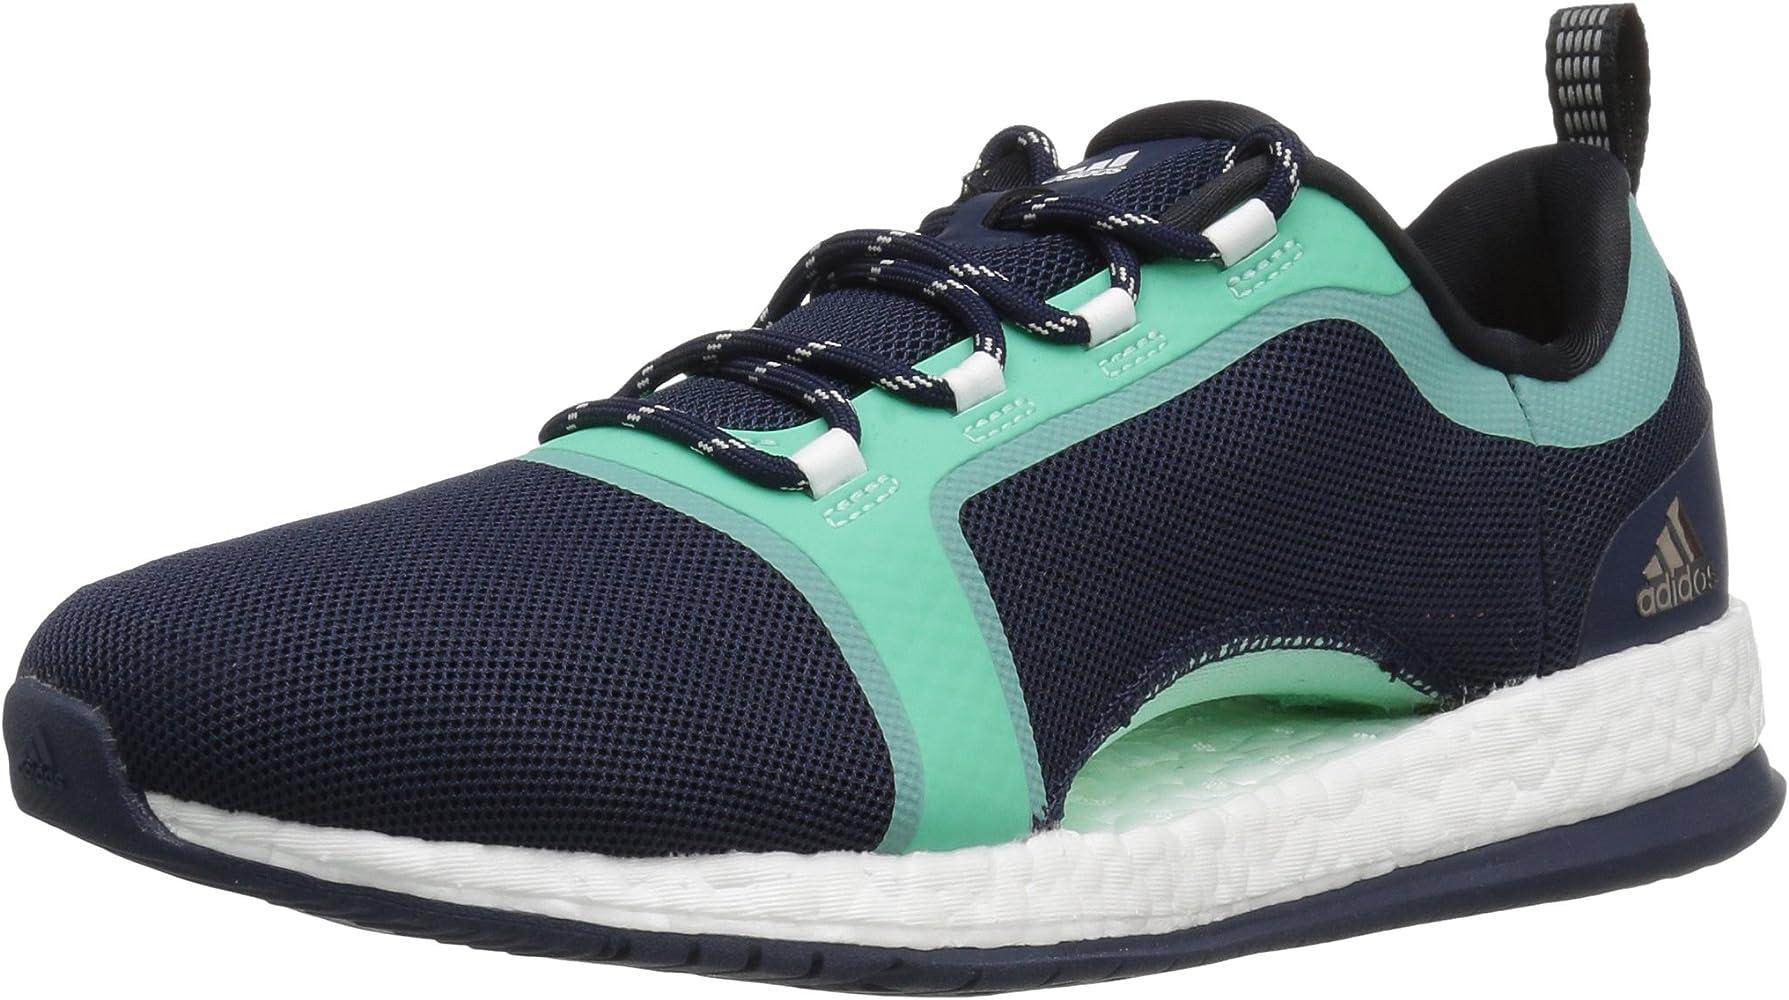 adidas Performance Women's Pure Boost X TR 2 Cross-Trainer Shoe